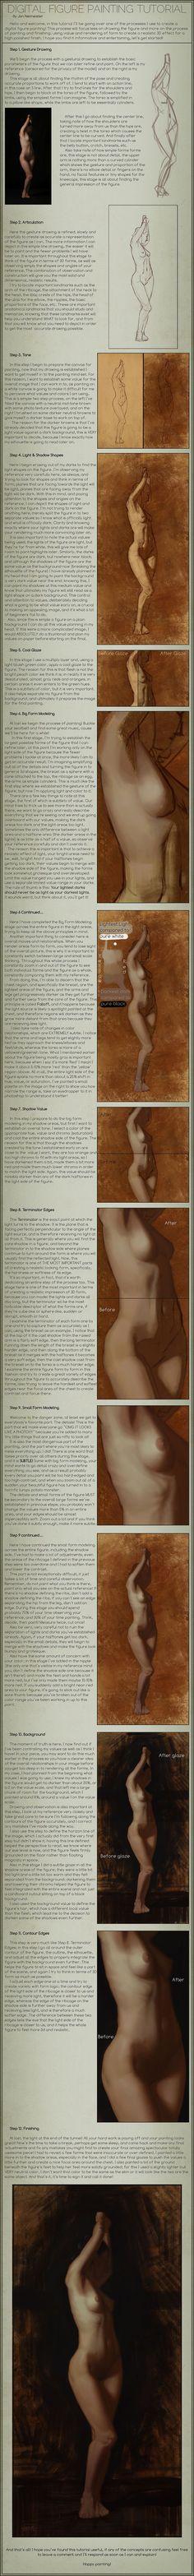 Anatomi Ten 30 / Anatomy Skin 30 - Digital Figure Painting Tutorial by ~Andantonius on deviantART - #Anatomi #anatomy #ten #skin #drawing #design #sketch #sketching #character #digital #digitalpainting